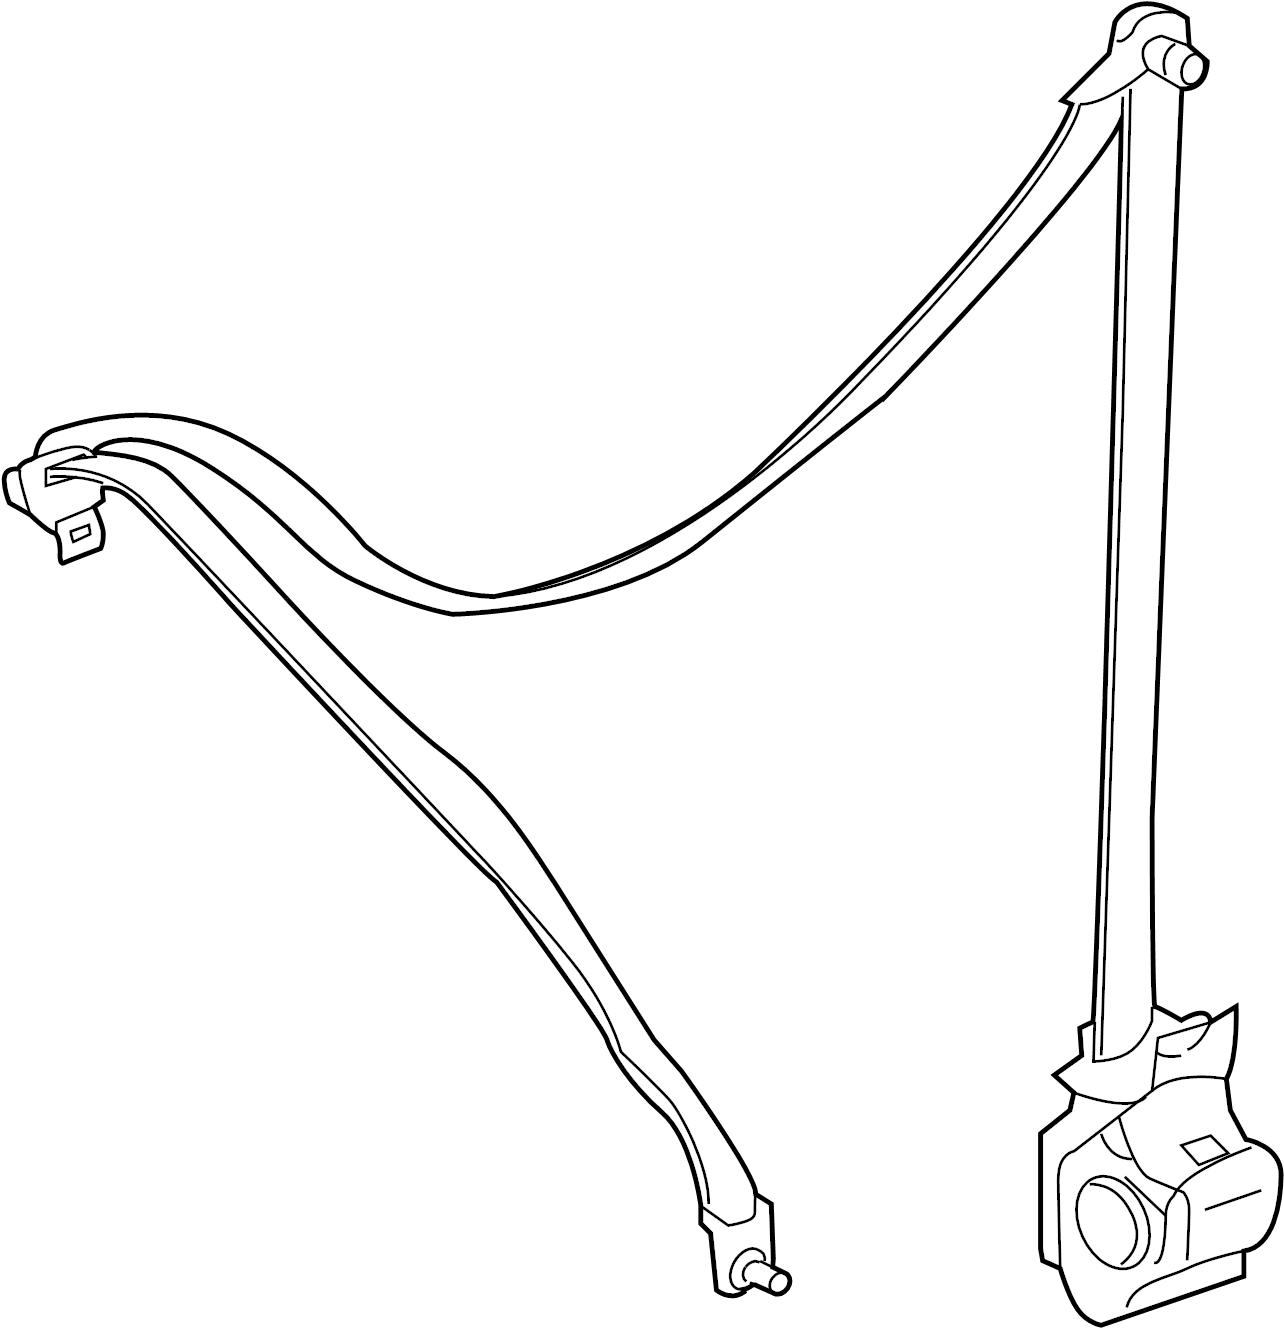 Ford Escape Seat Belt Lap and Shoulder Belt. Charcoal